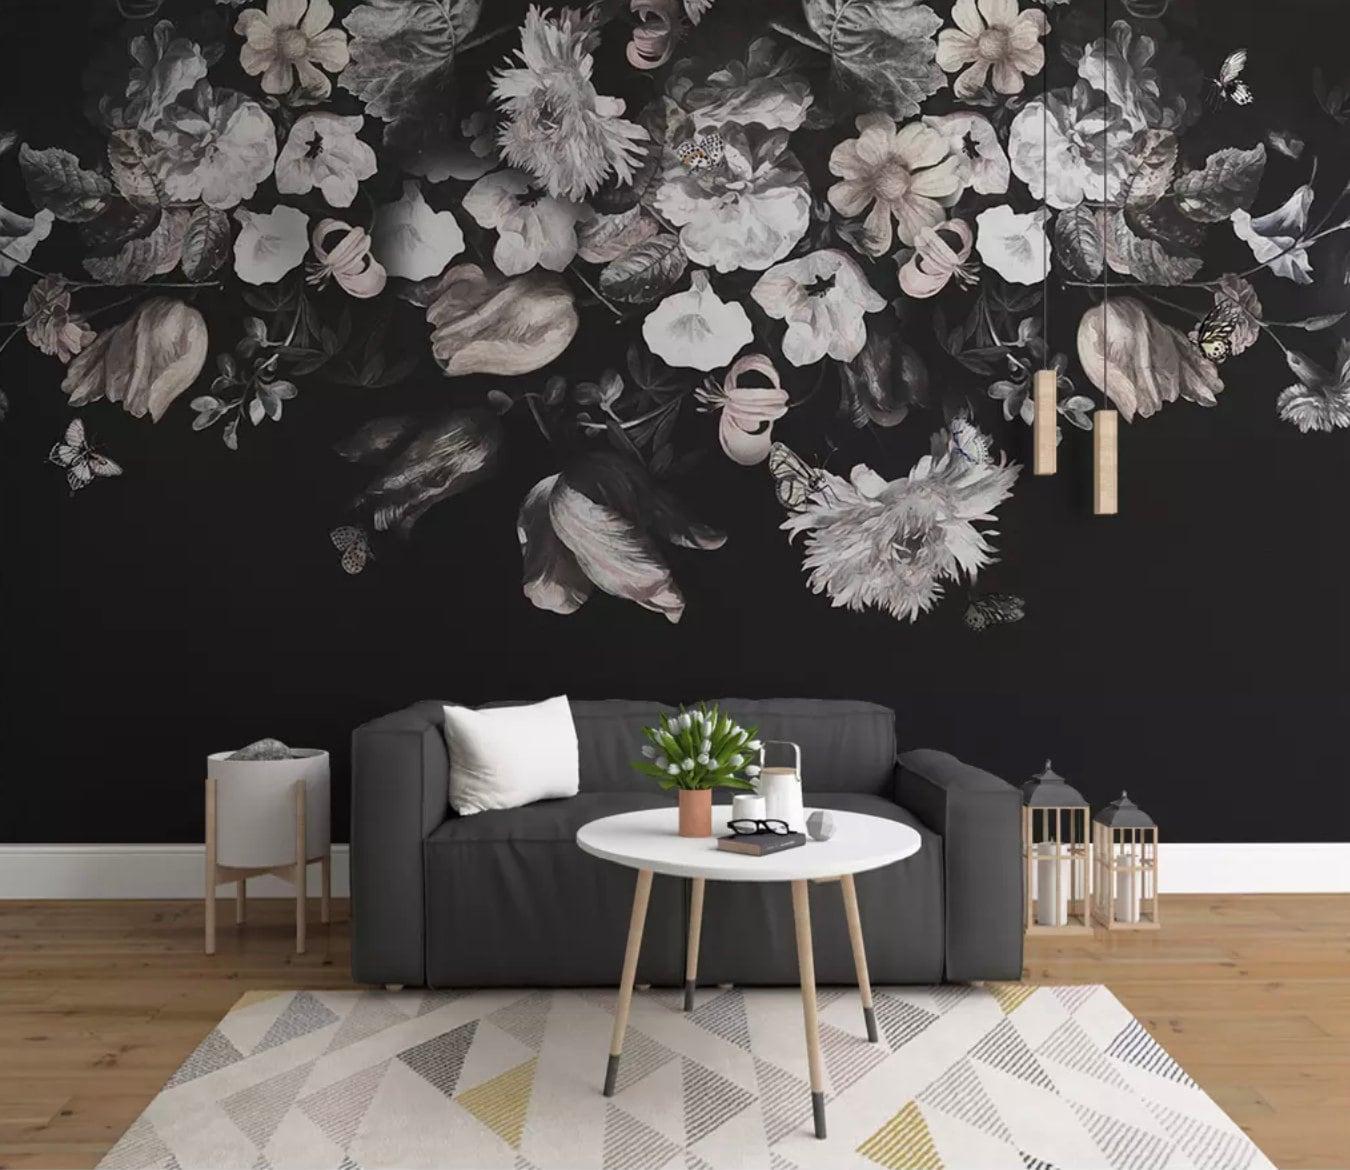 Dark Floral Wallpaper Peony Flower Wall Mural Vintage Floral Etsy